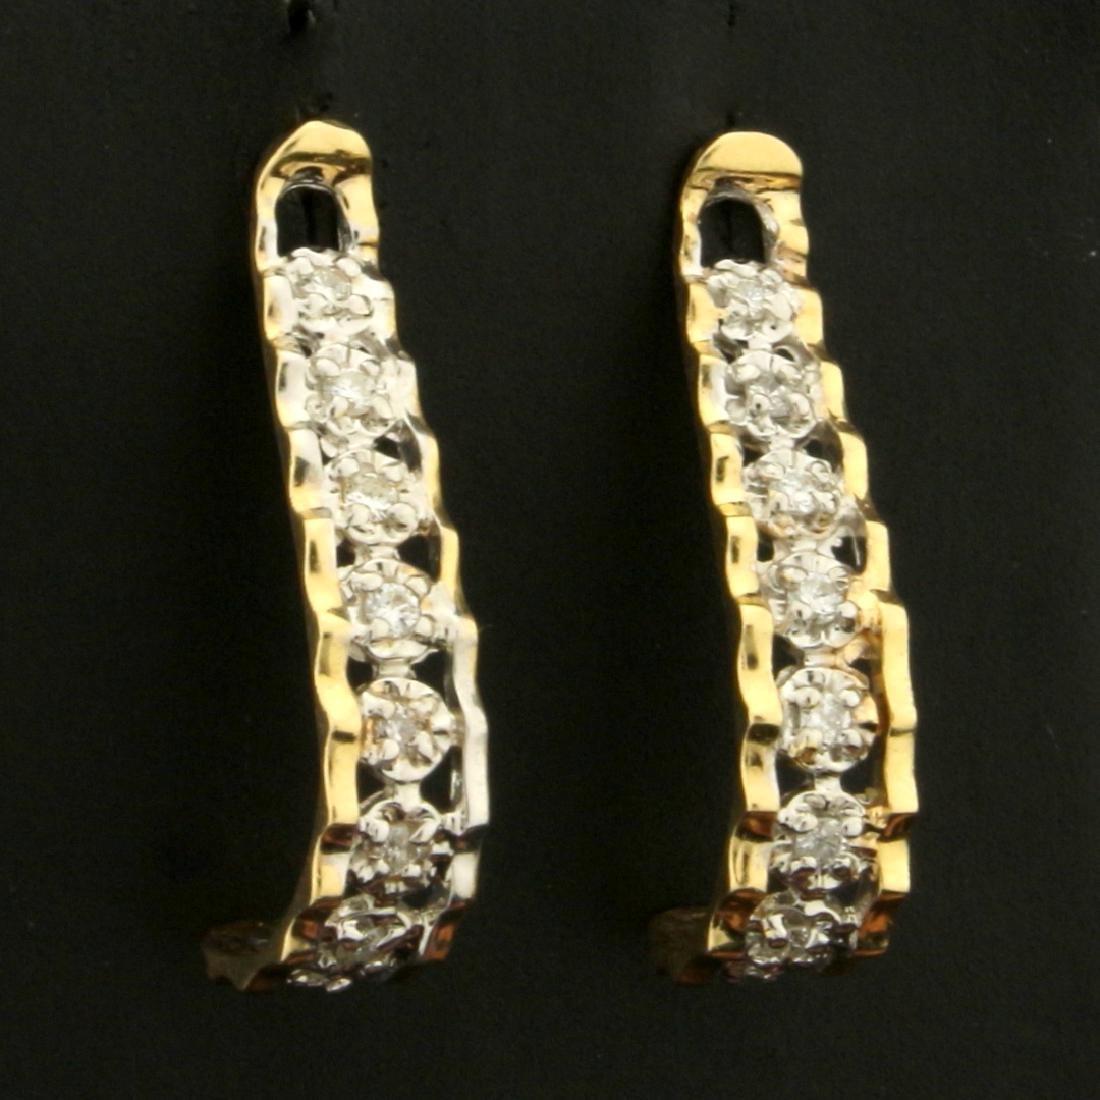 J Shaped Drop Diamond Earrings in 14K Yellow and White